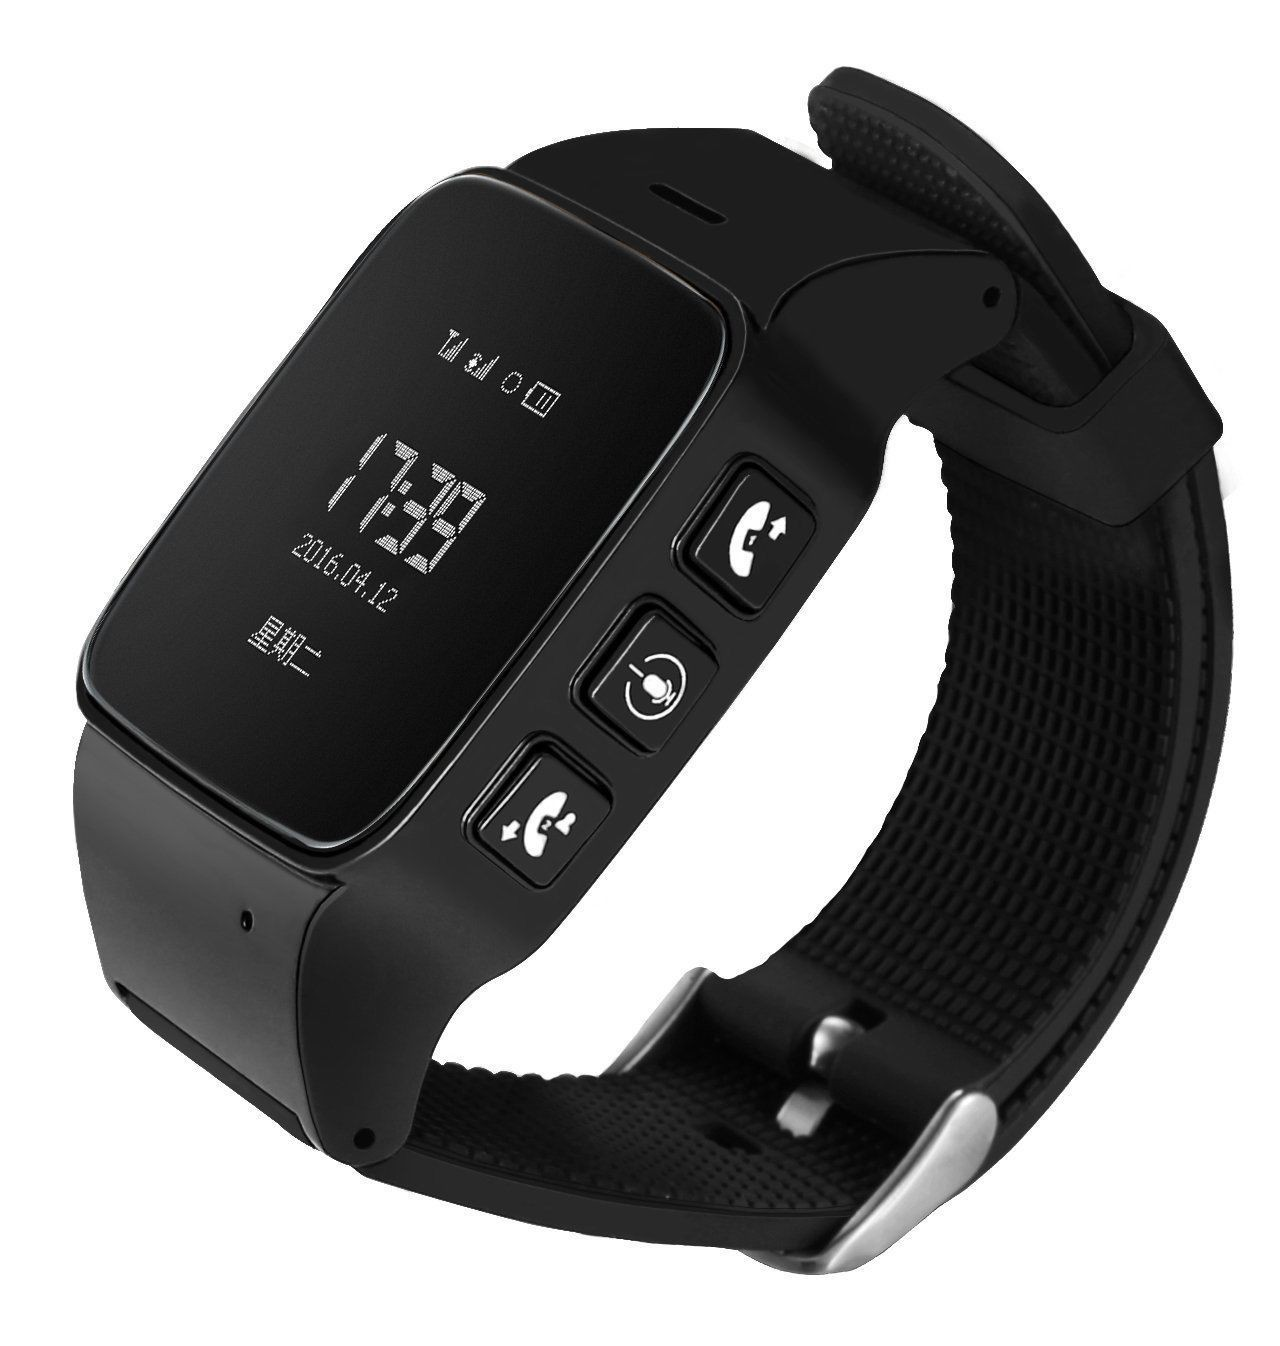 Techstar Ceas GPS Copii si Seniori iUni U100, Telefon incorporat, Pedometru, Notificari, Wi-fi, Black